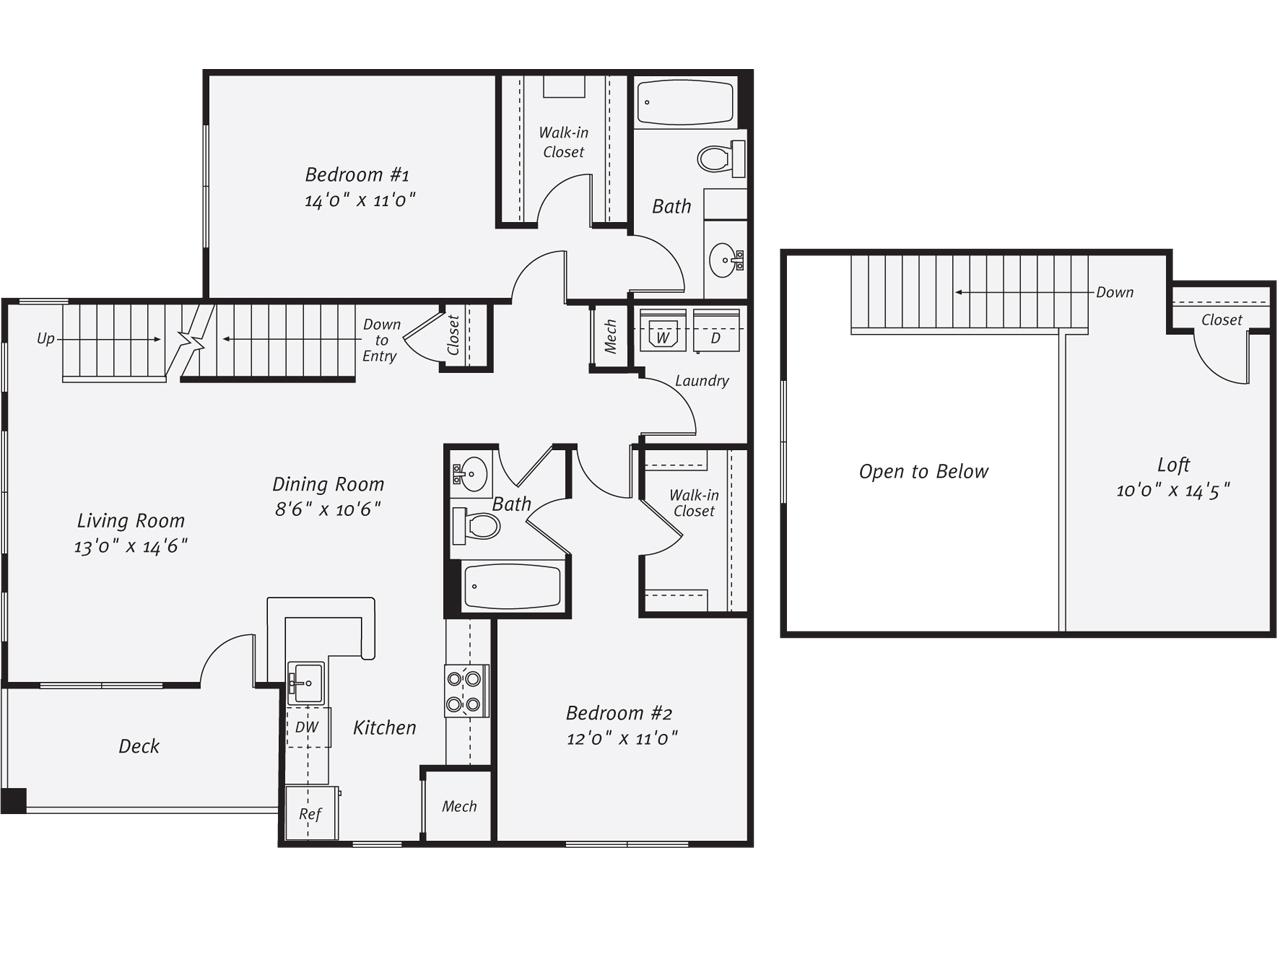 Ny coram thepointatpineridge p0571769 ny014 b9l 2 floorplan